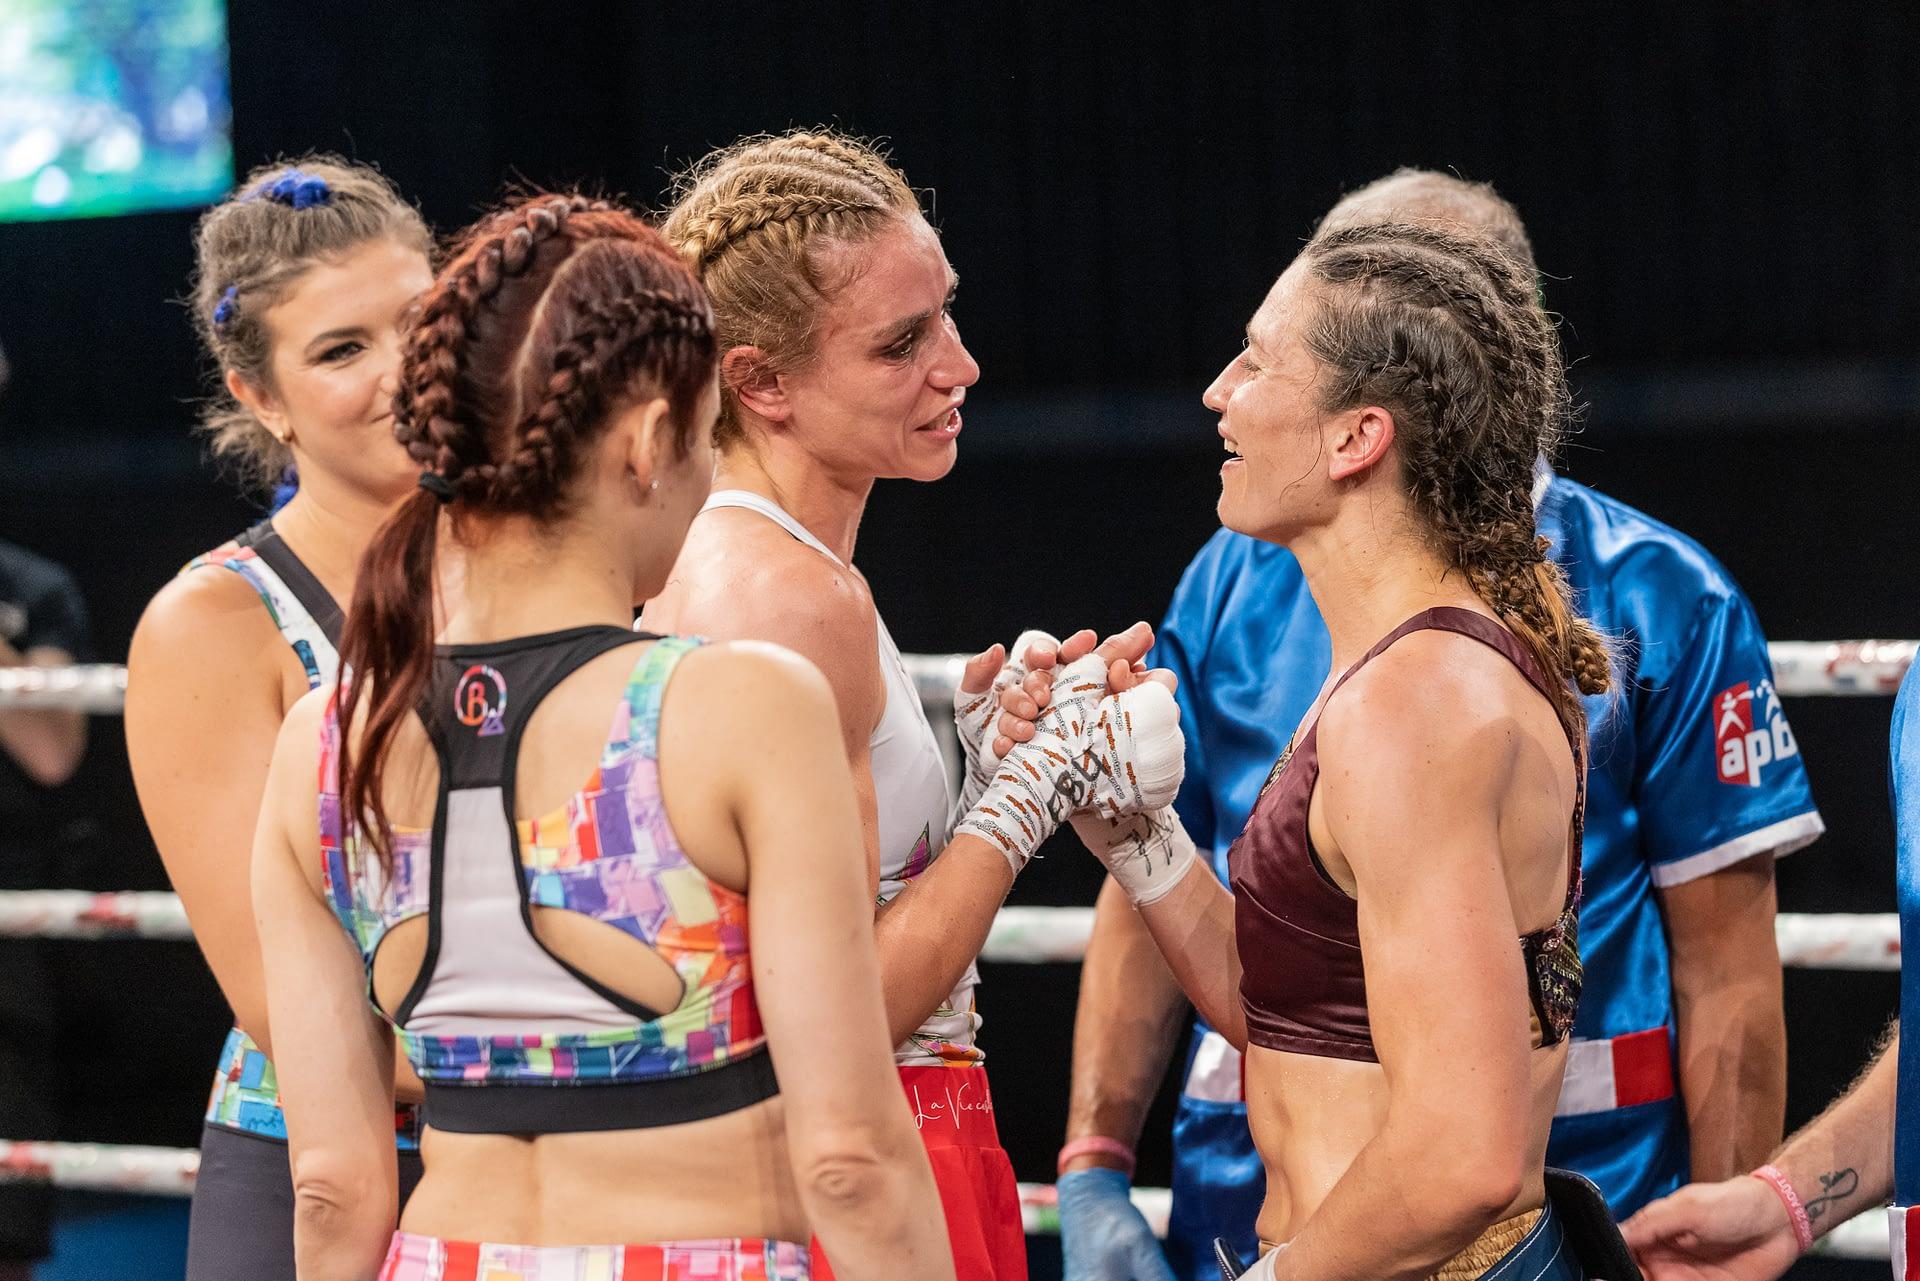 Boxing Gala - Olivia Boa vs. Oshin Derieuw by STEMUTZ, 28.08.2021